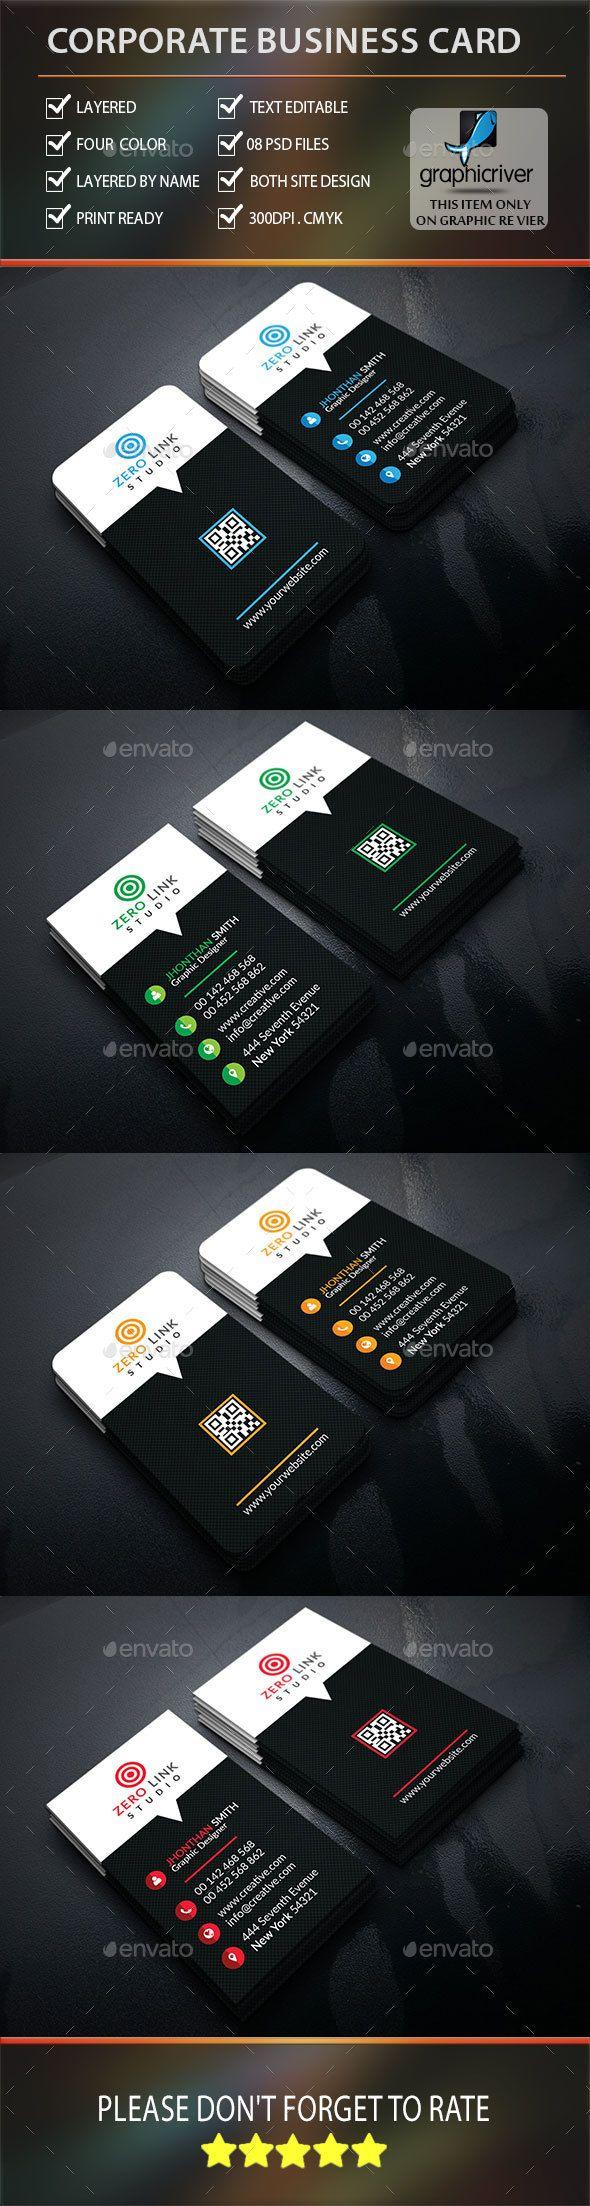 Simple professional business card business cards business and simple professional business card colourmoves